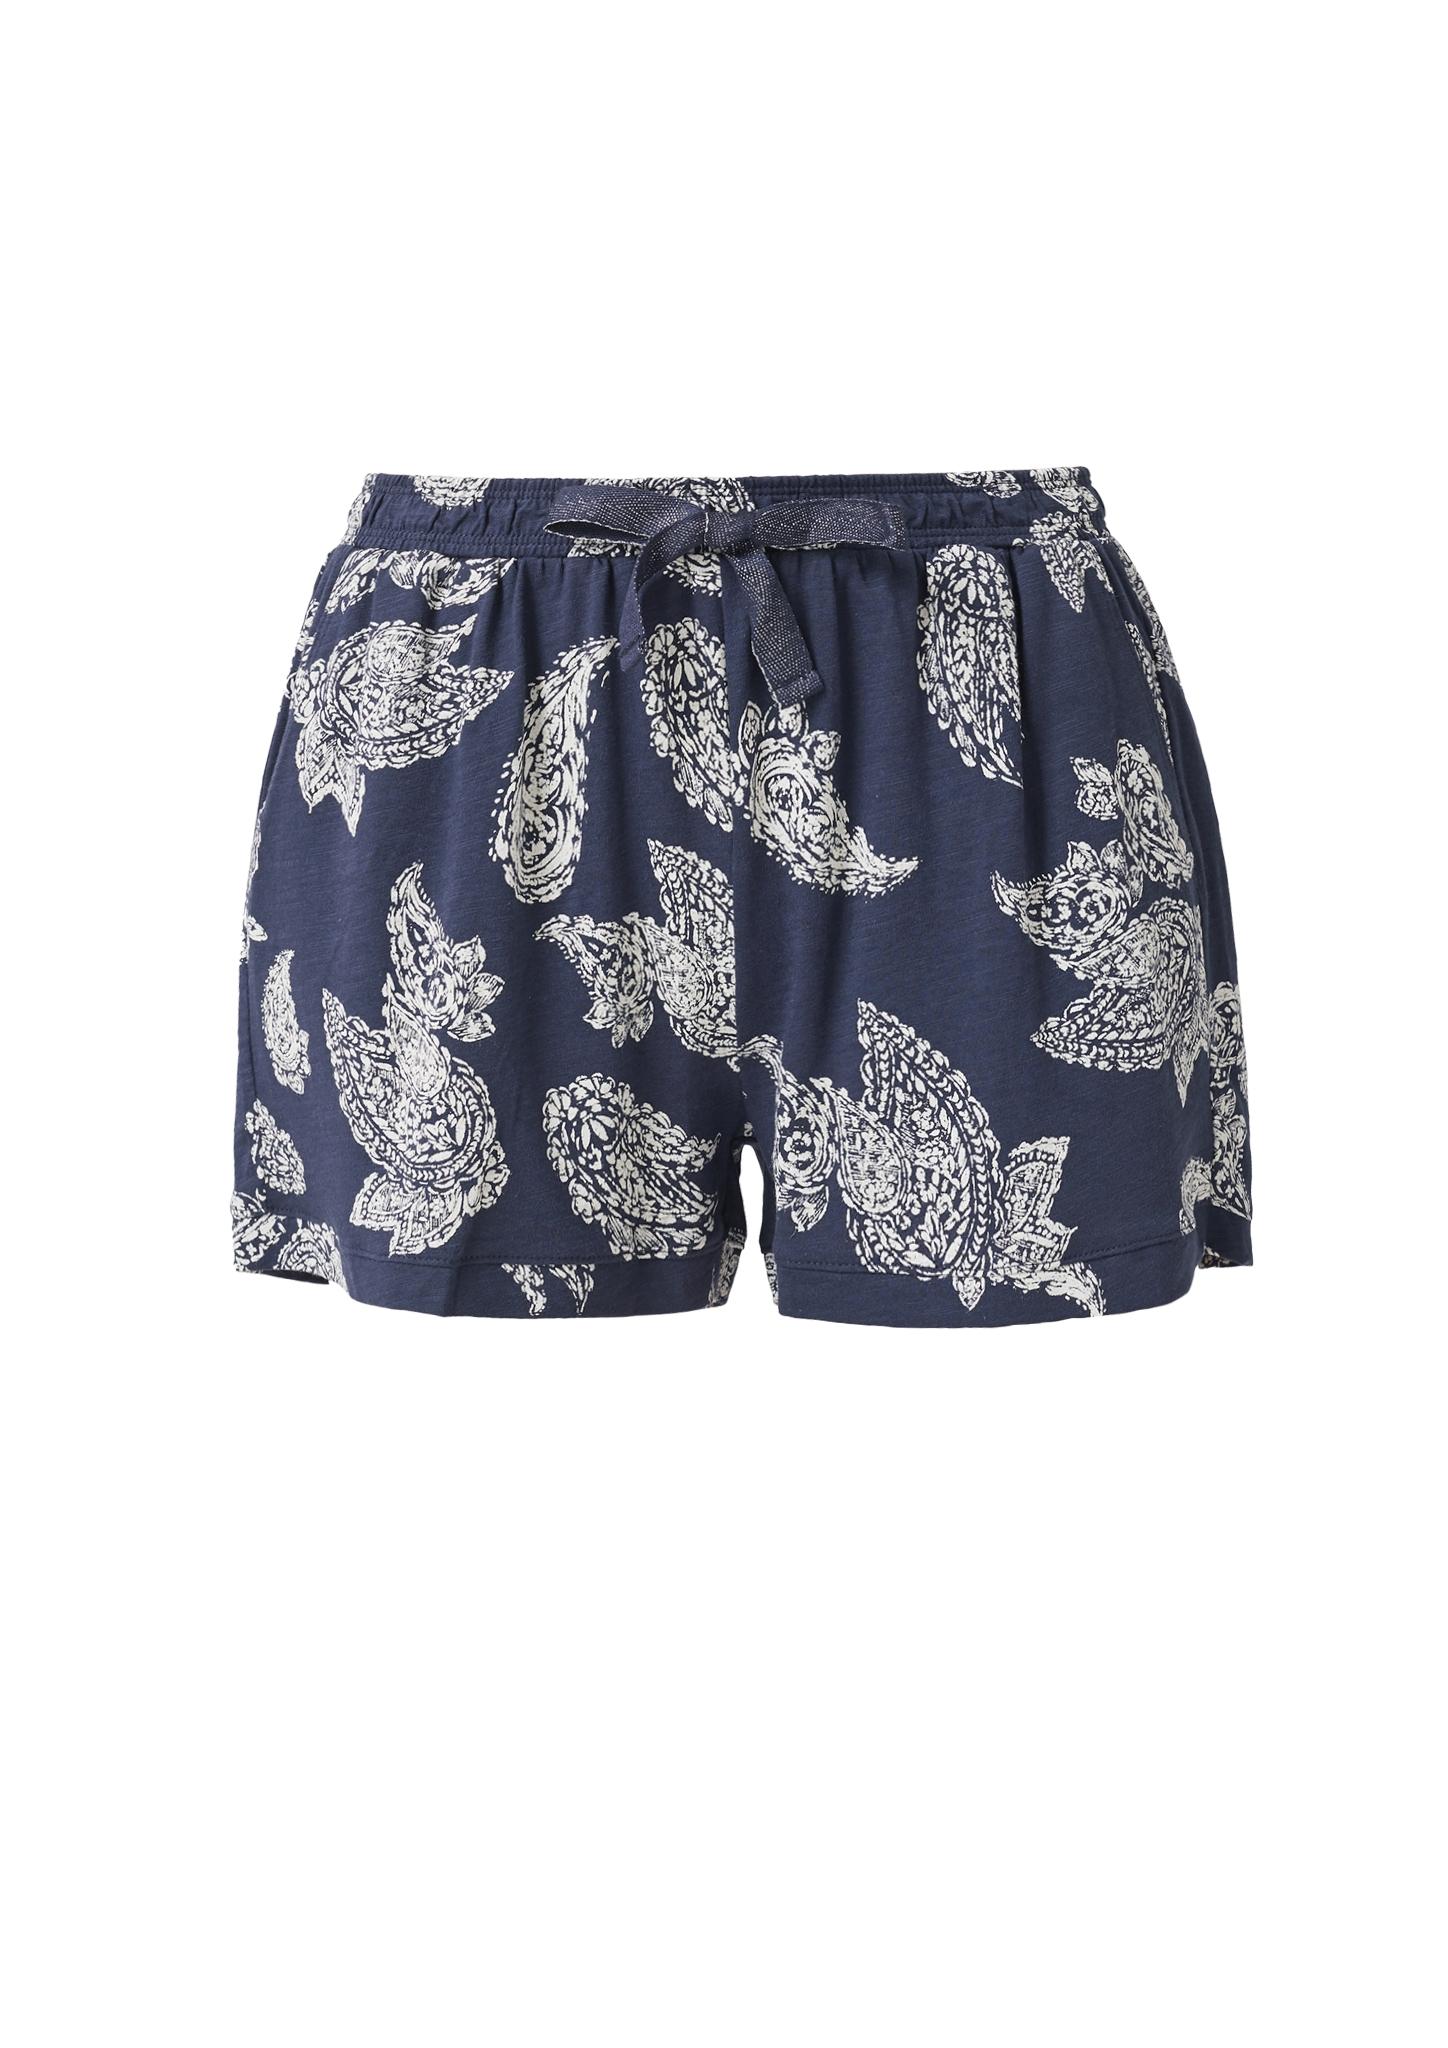 s-Oliver-Casual-Women-Jerseyshorts-mit-Musterprint-Neu Indexbild 5